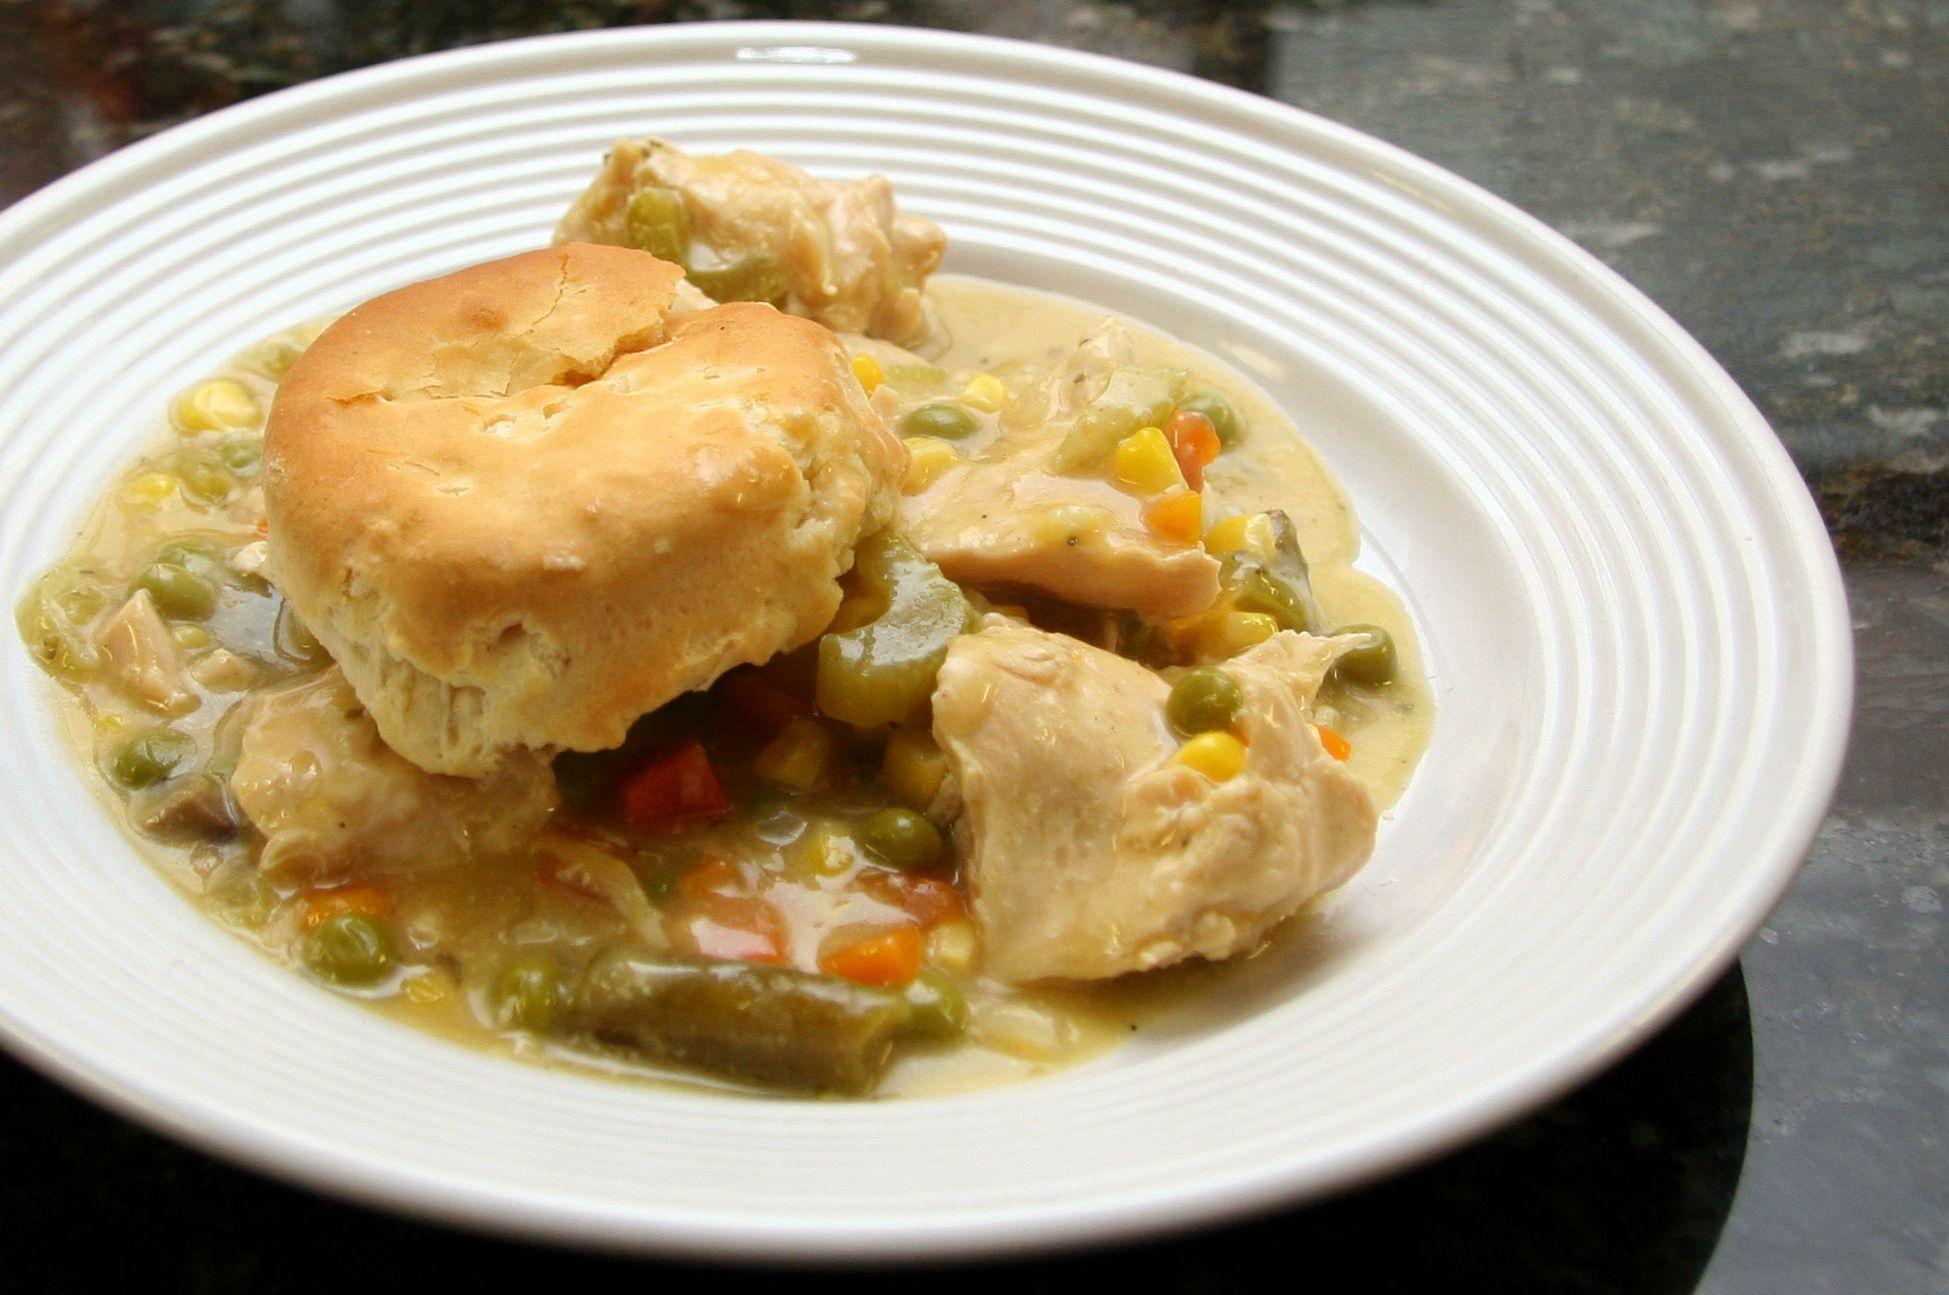 Crock Pot Chicken and Biscuits